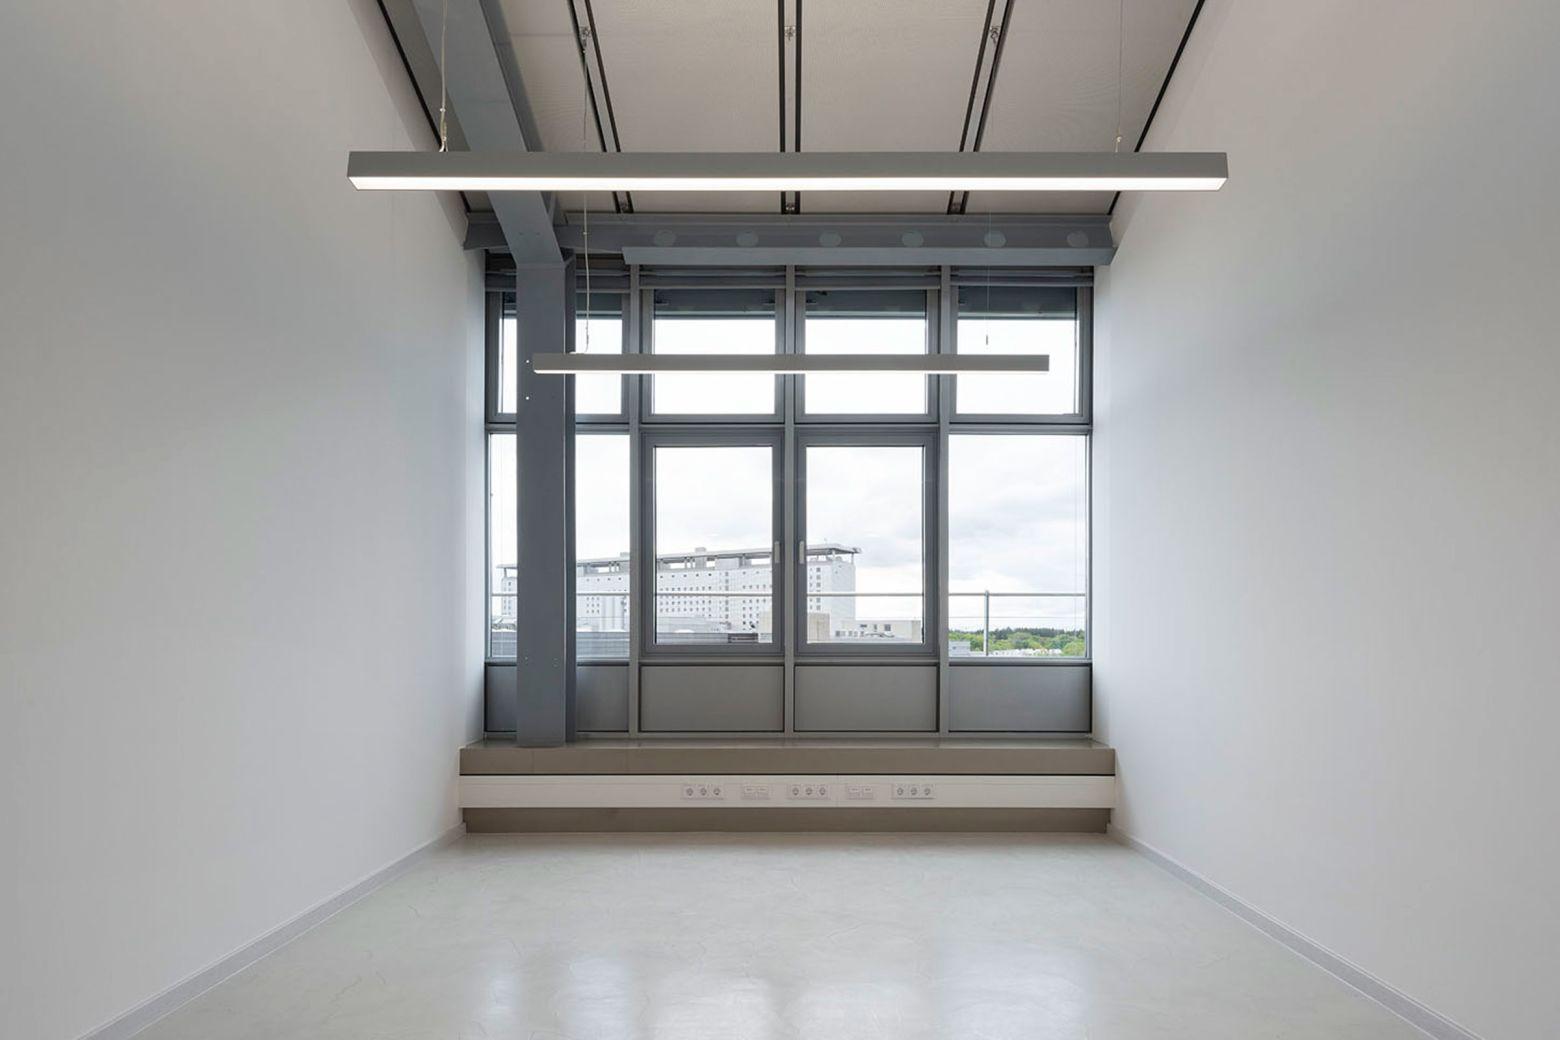 Doppelbüro Blickrichtung Fassade